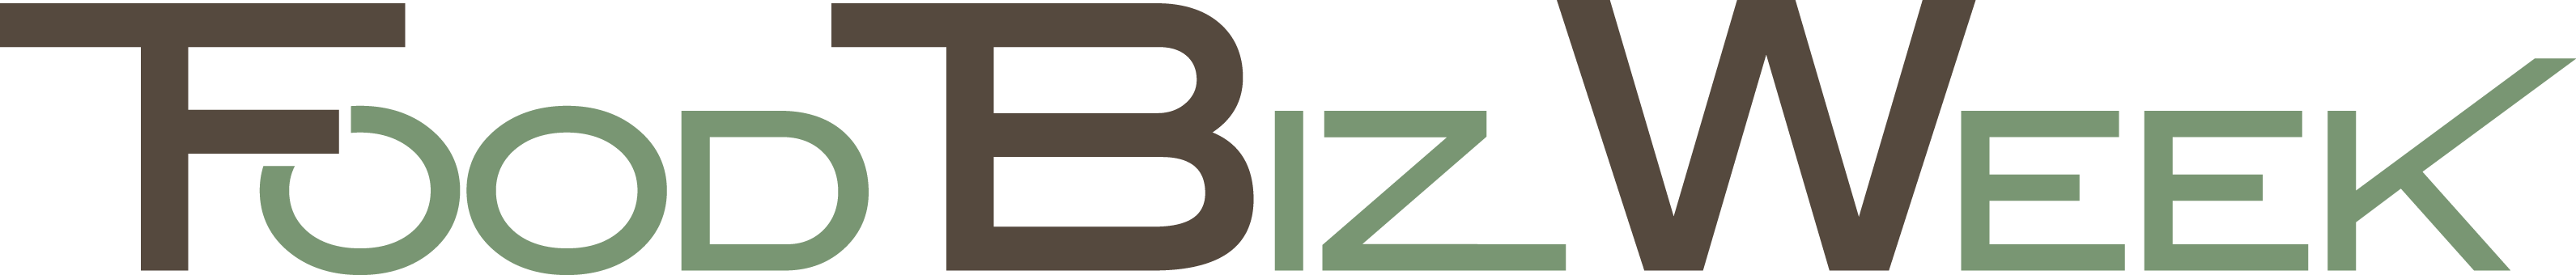 Food Biz Week Logo